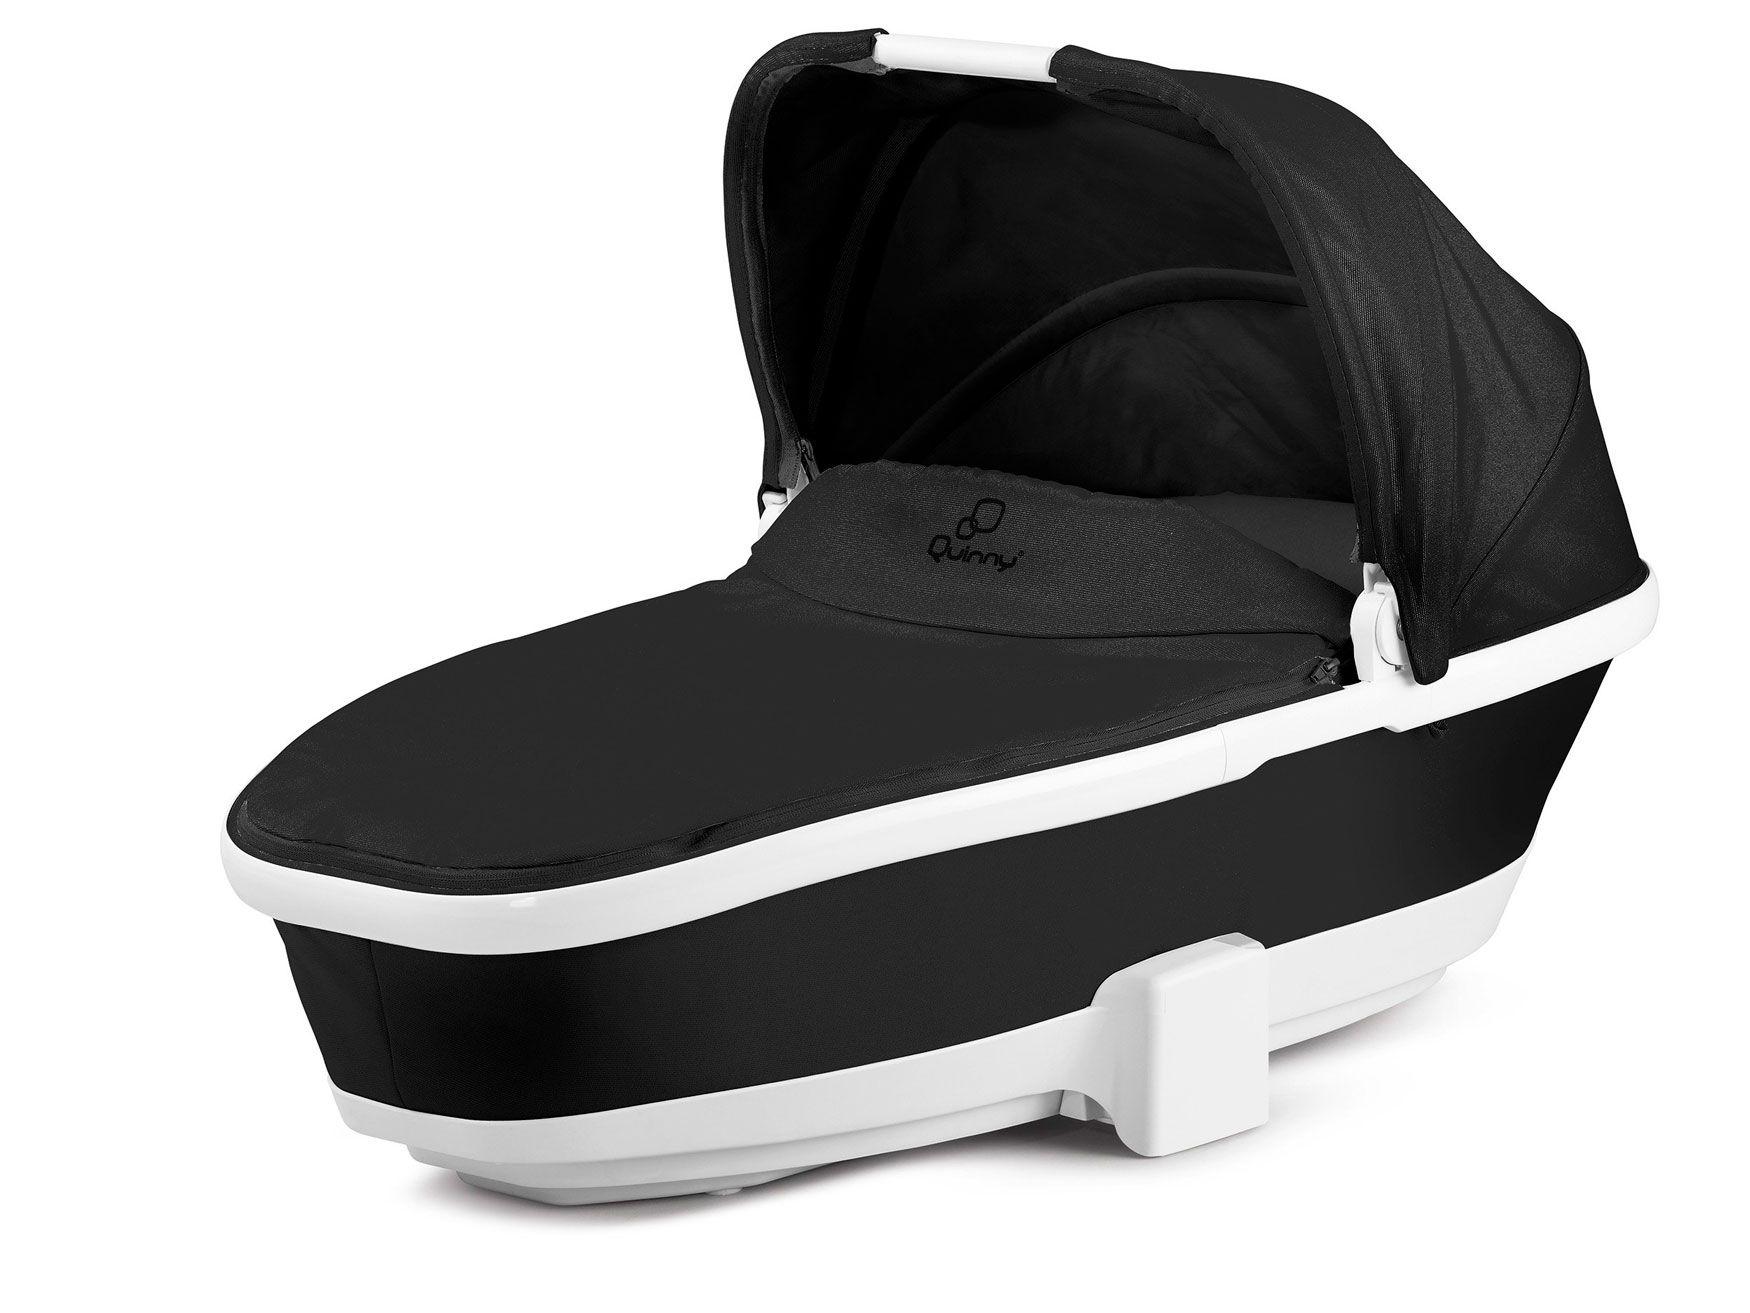 Moises Foldable Carrycot Black Irony - Quinny Dorel Ref 7690